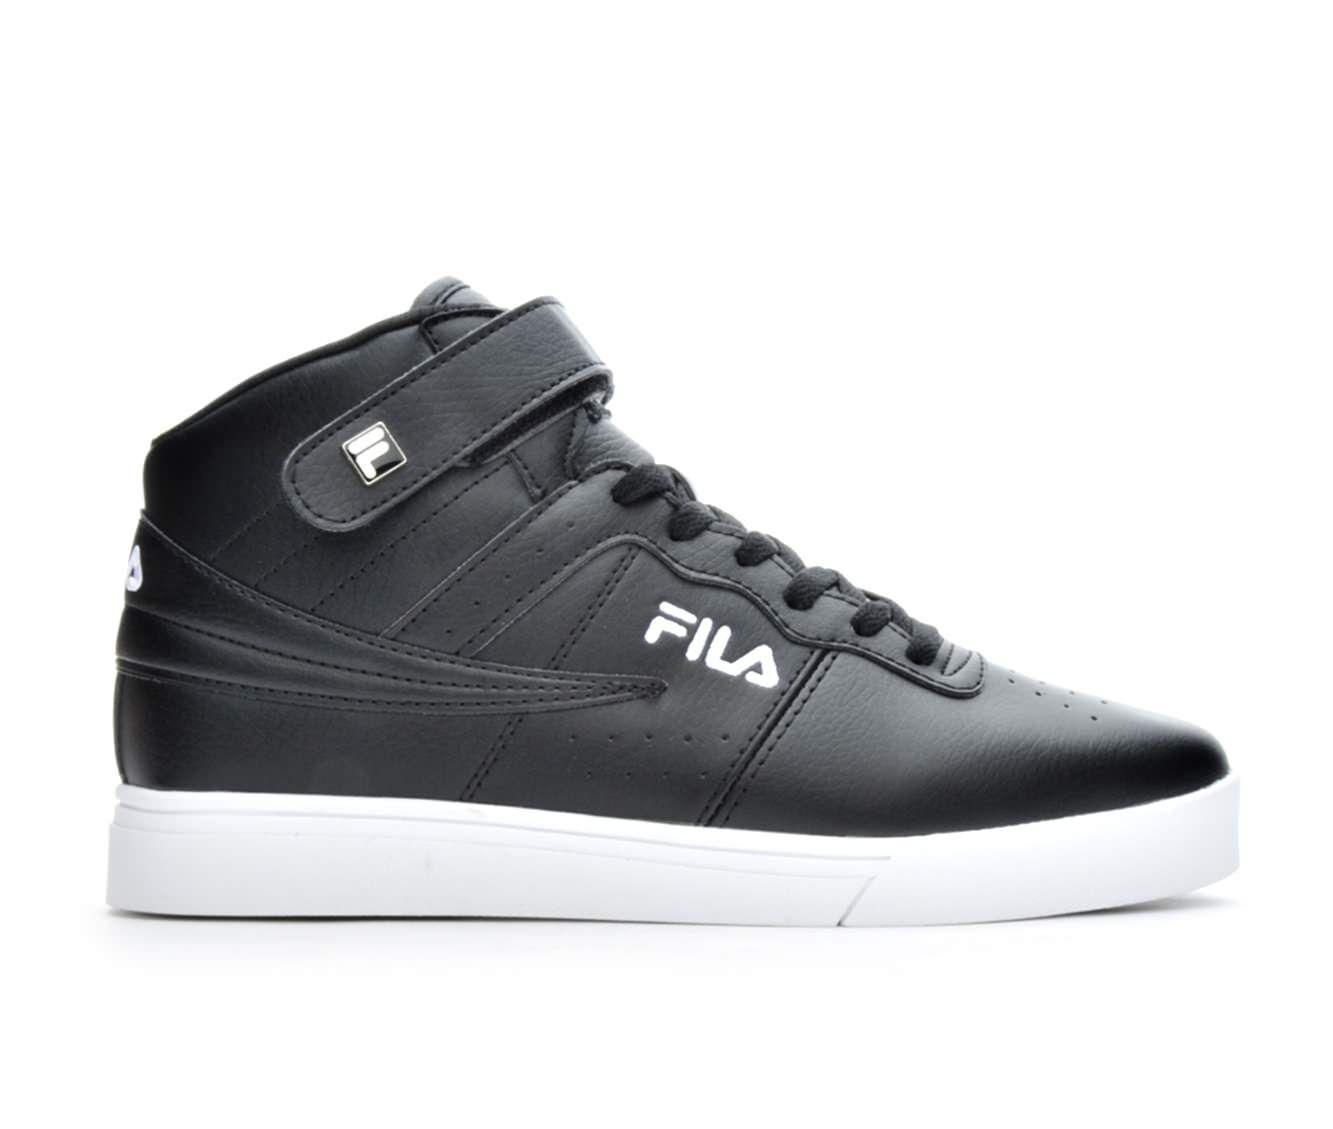 Men's Fila Vulc 13 Mid Plus Retro Sneakers Black/White